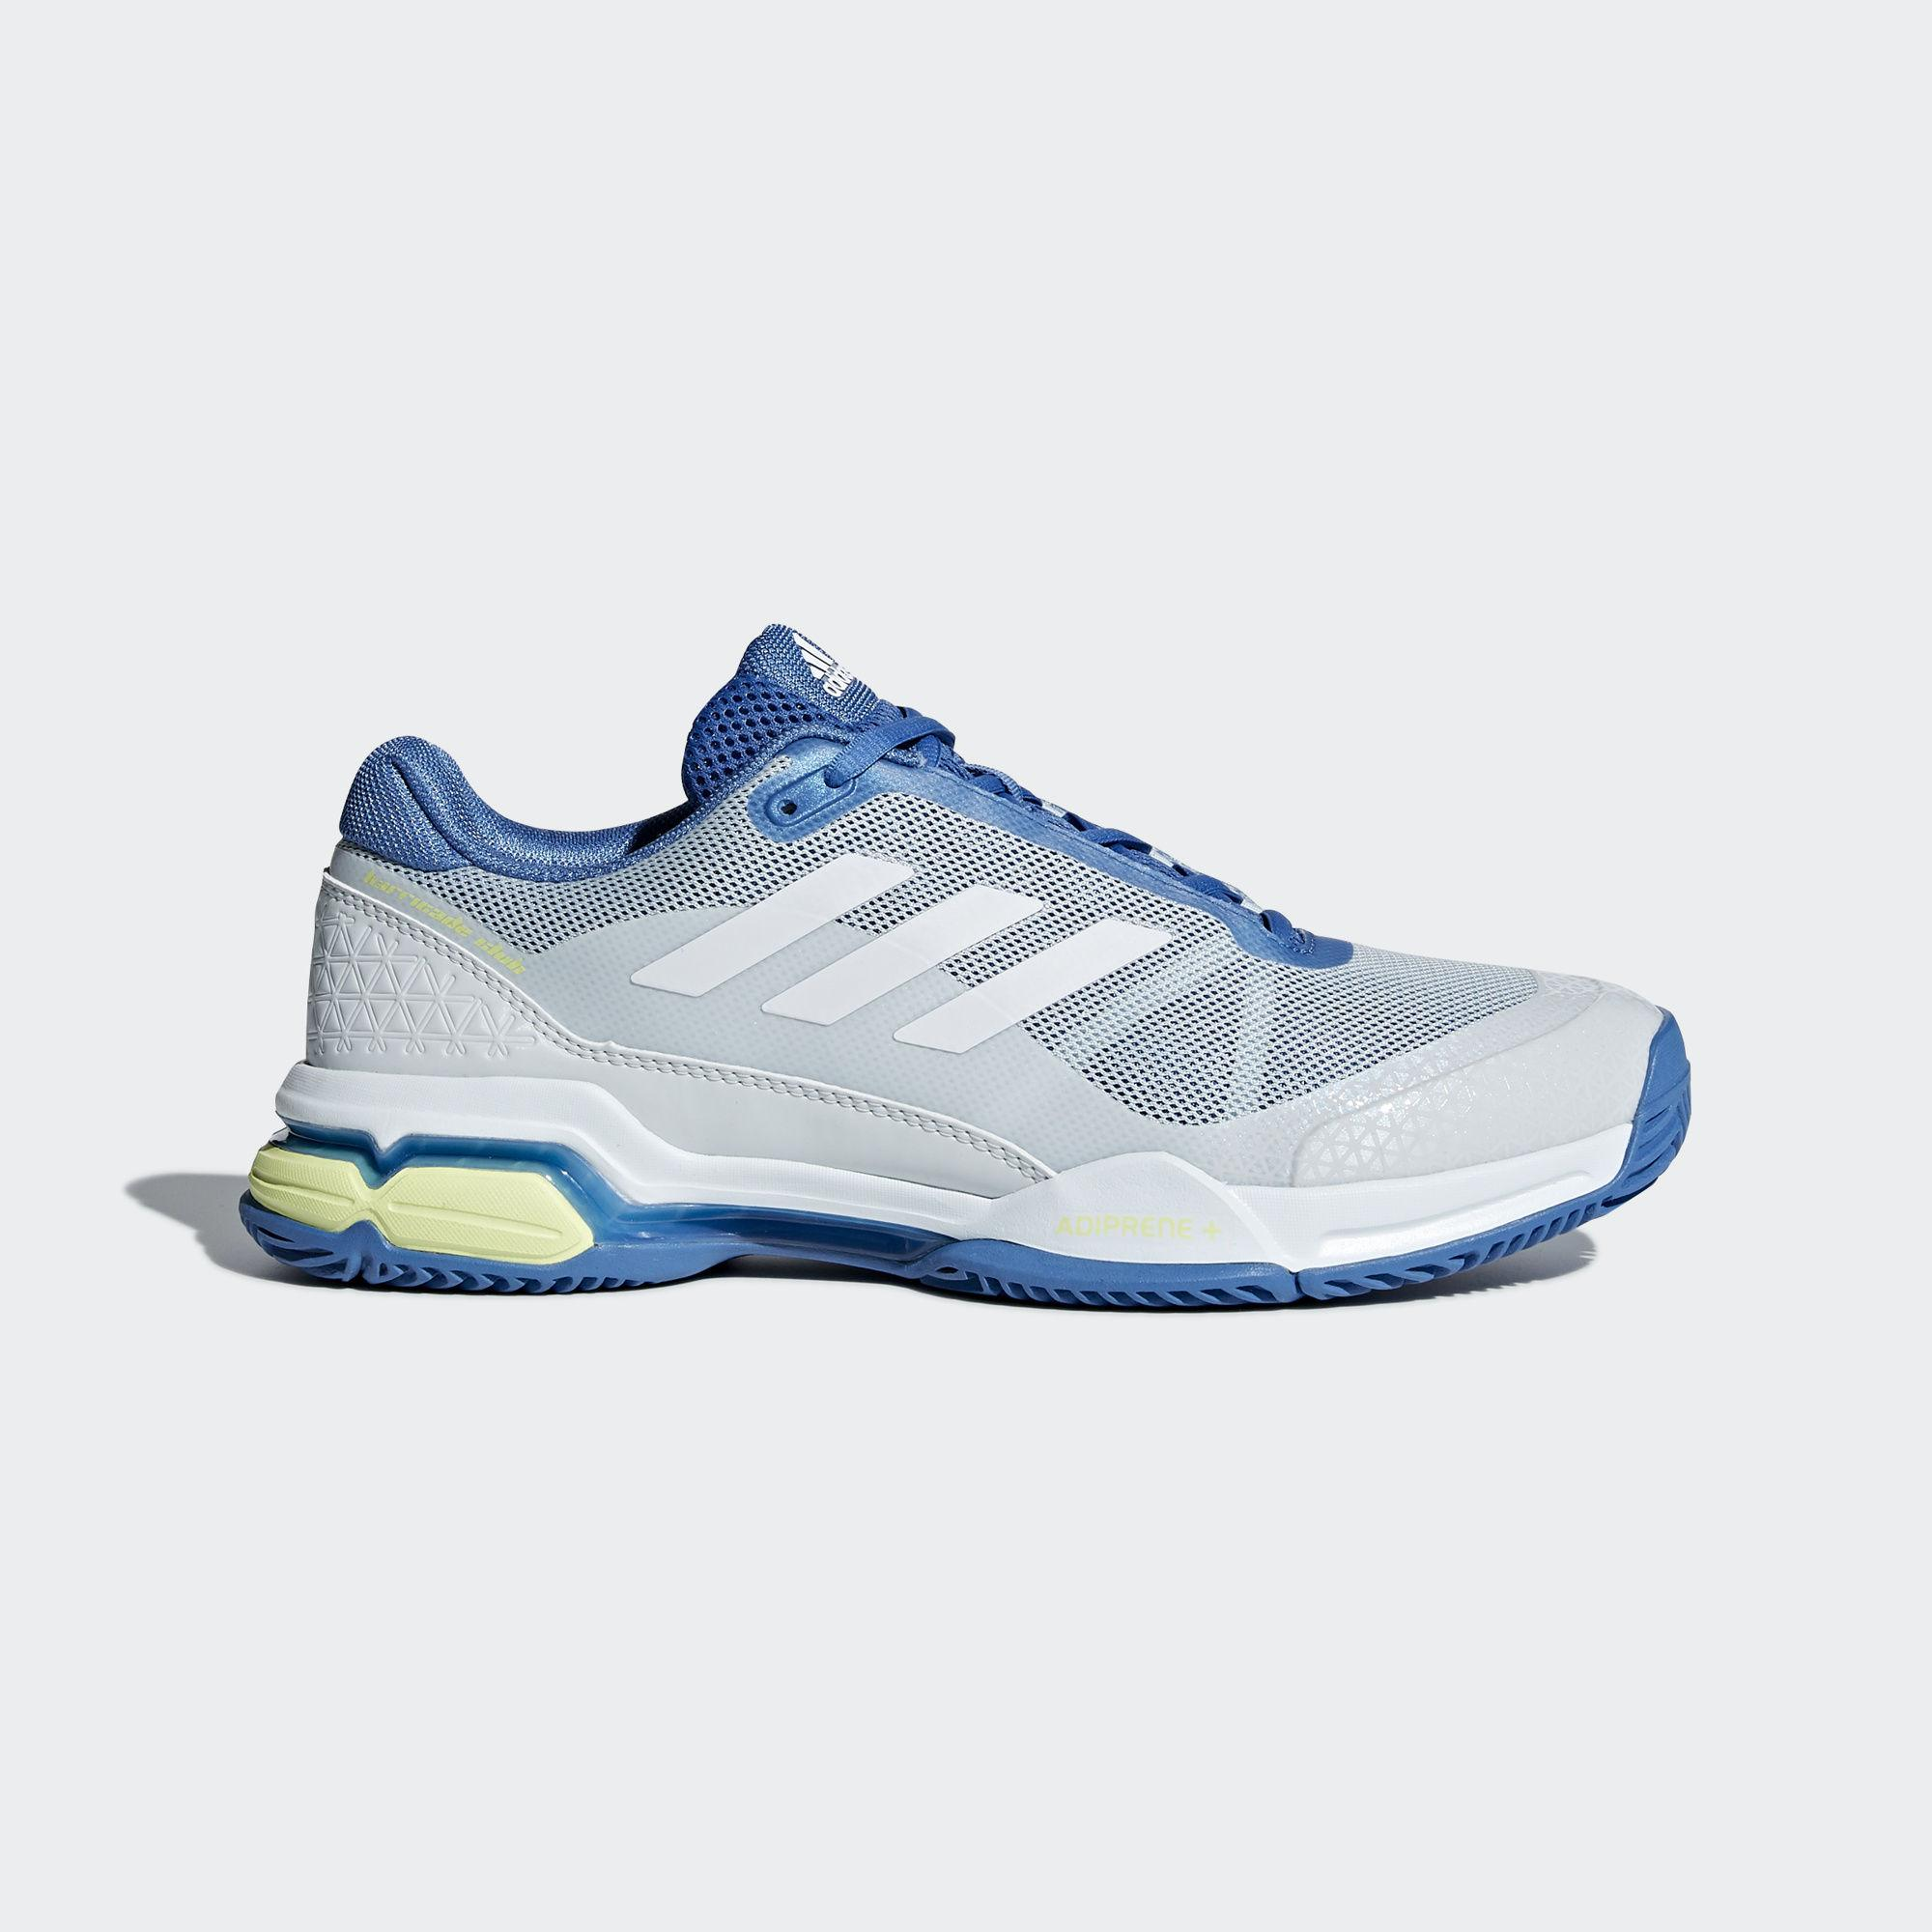 95abcbe7ae141 Adidas Mens Barricade Club Tennis Shoes - Blue - Tennisnuts.com